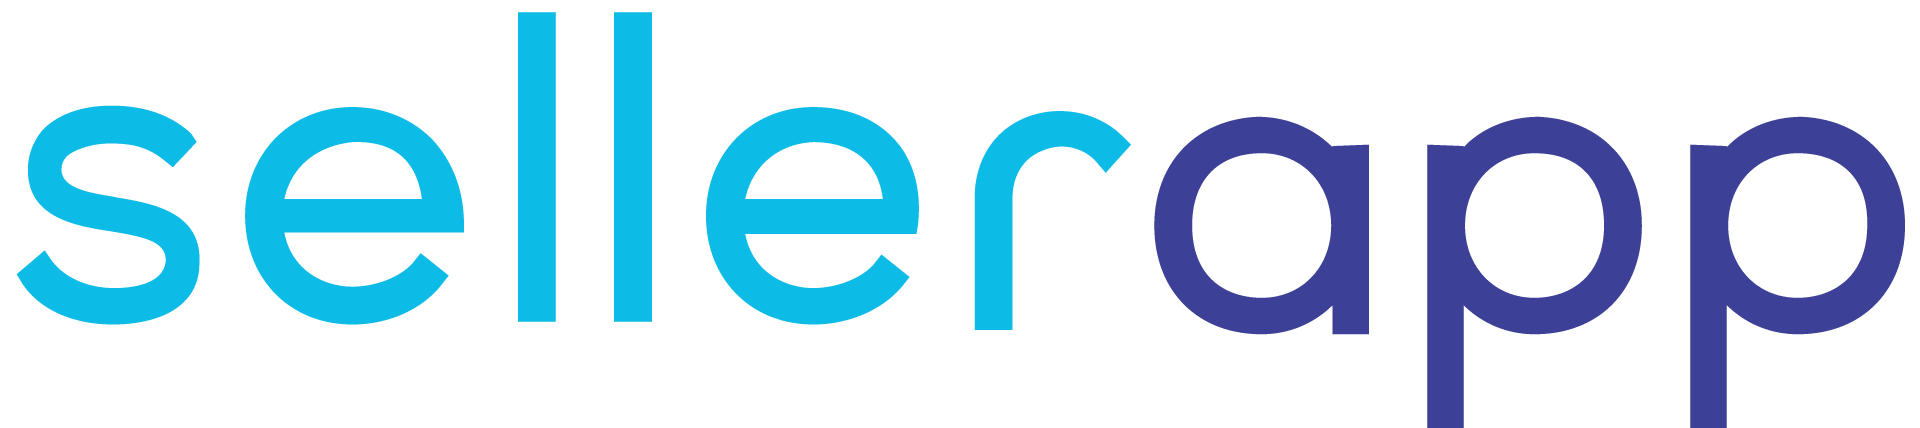 https://cdn.sellerapp.com/go-seller/speaker-logos/sellerapp.png